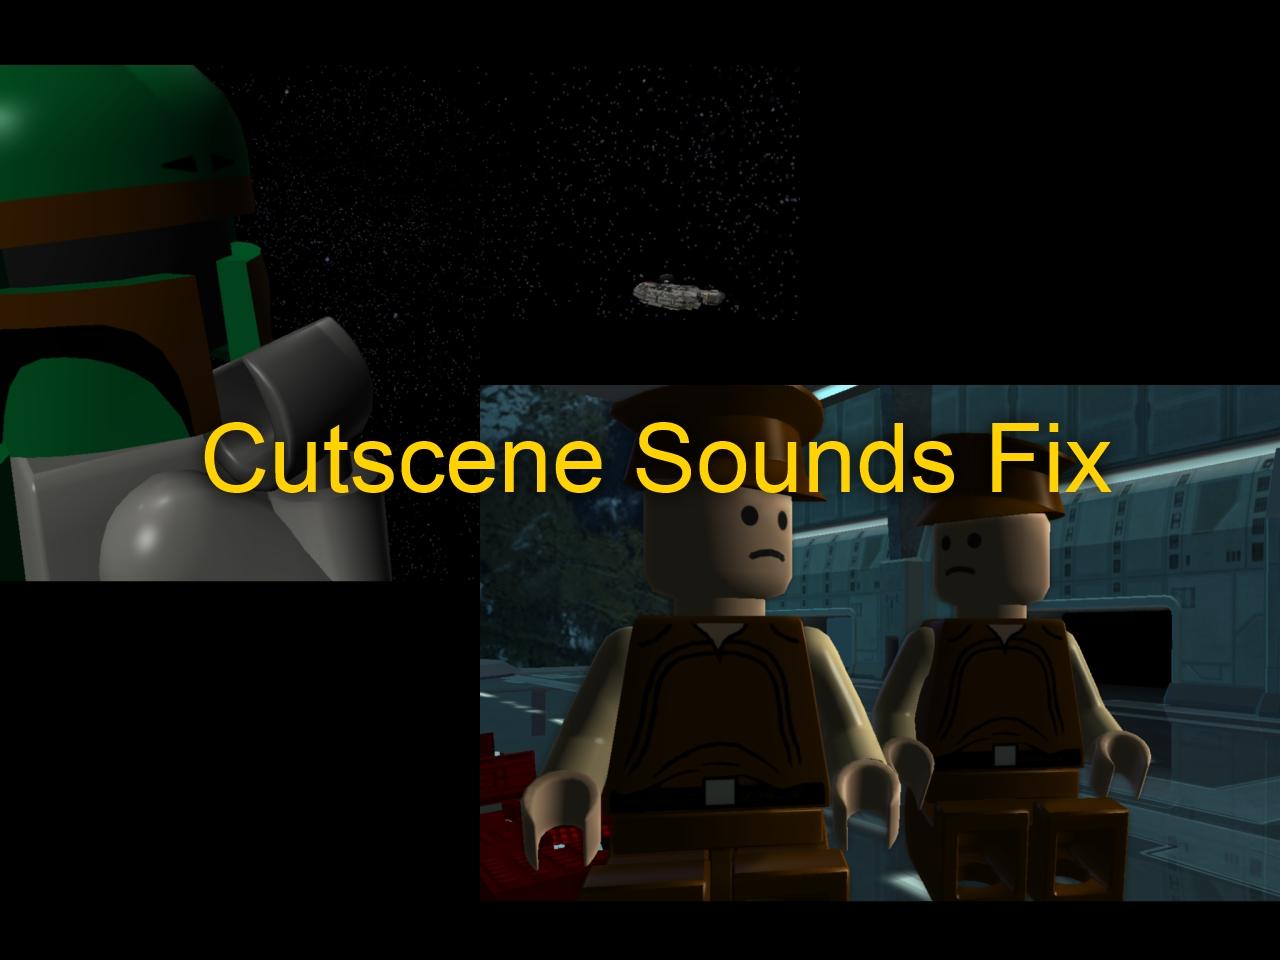 Lego Star Wars The Complete Saga Cutscene Sounds Fix File